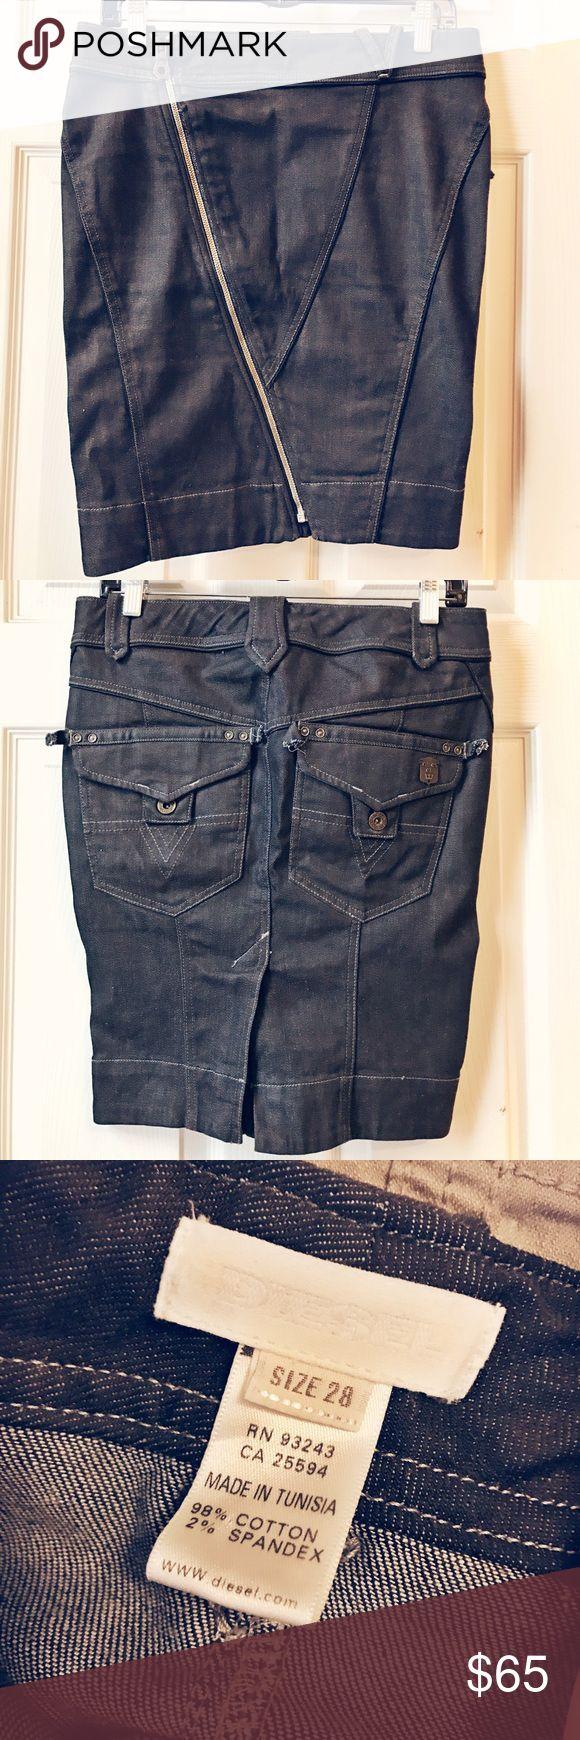 ⚫️DIESEL⚪️Denim Skirt Unique style Denim skirt with asymmetrical shape / diagonal zipper / detailed stitching / stretch and comfortable / worn twice Diesel Skirts